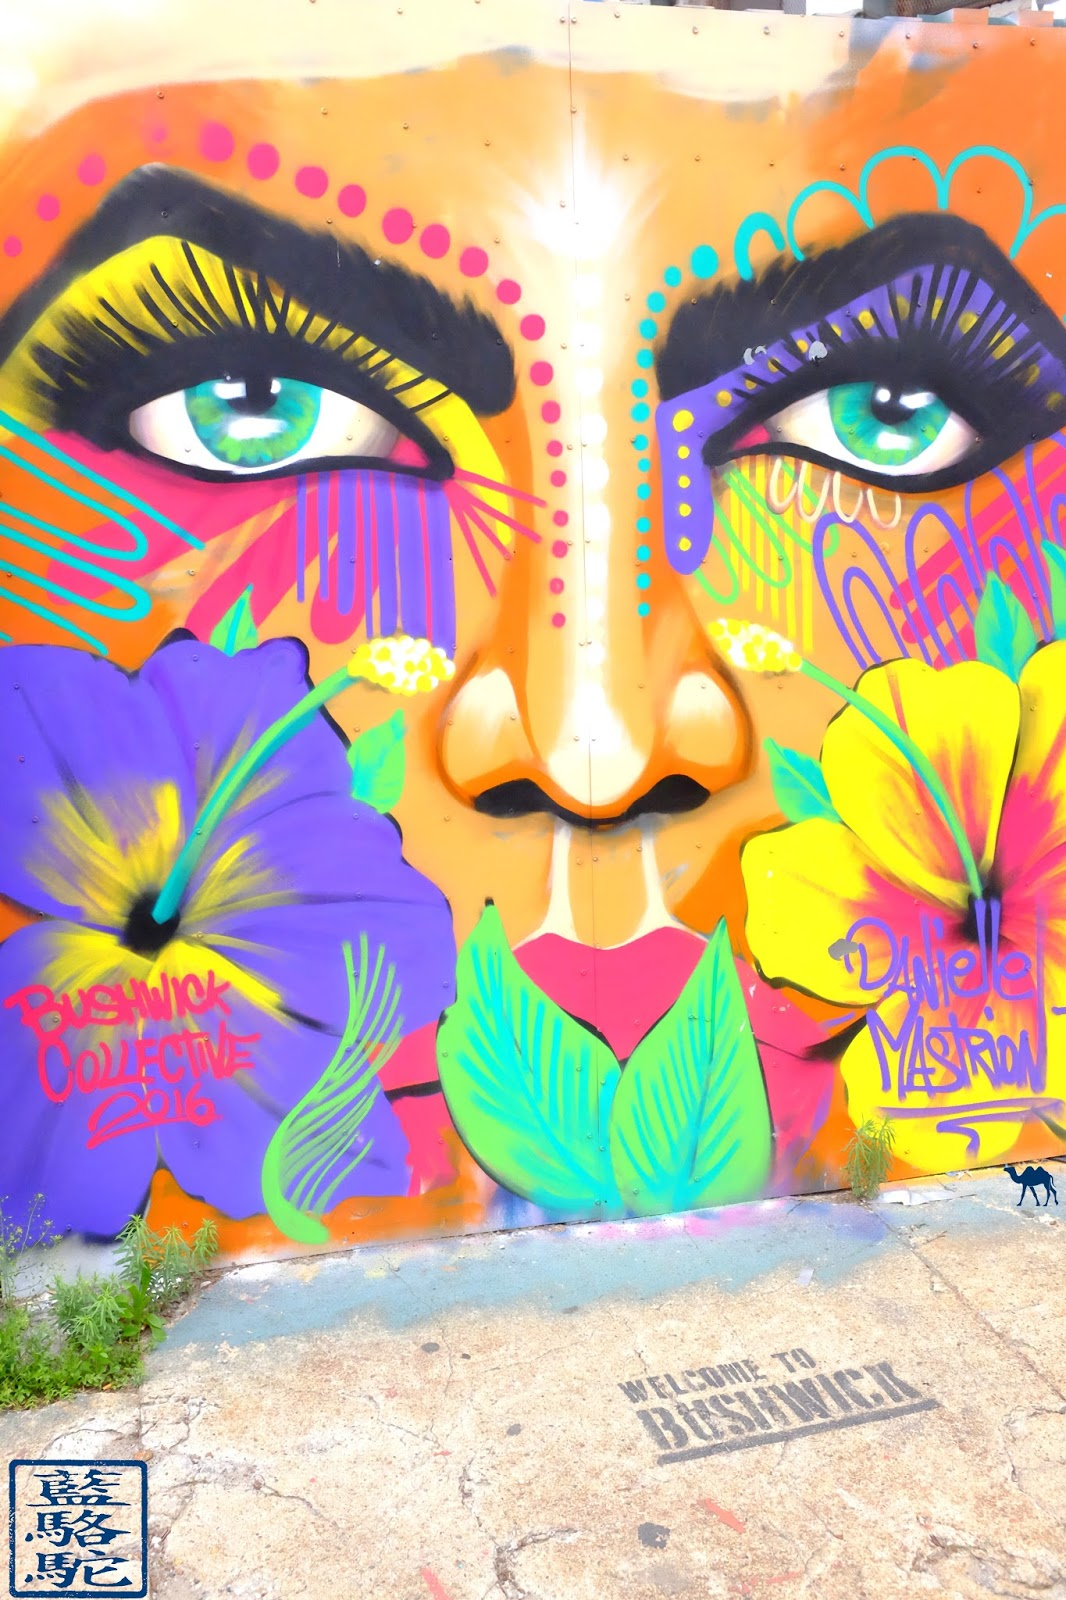 Le Chameau Bleu - Voyage à New York - Balade à Bushwick sur fond de Street Art